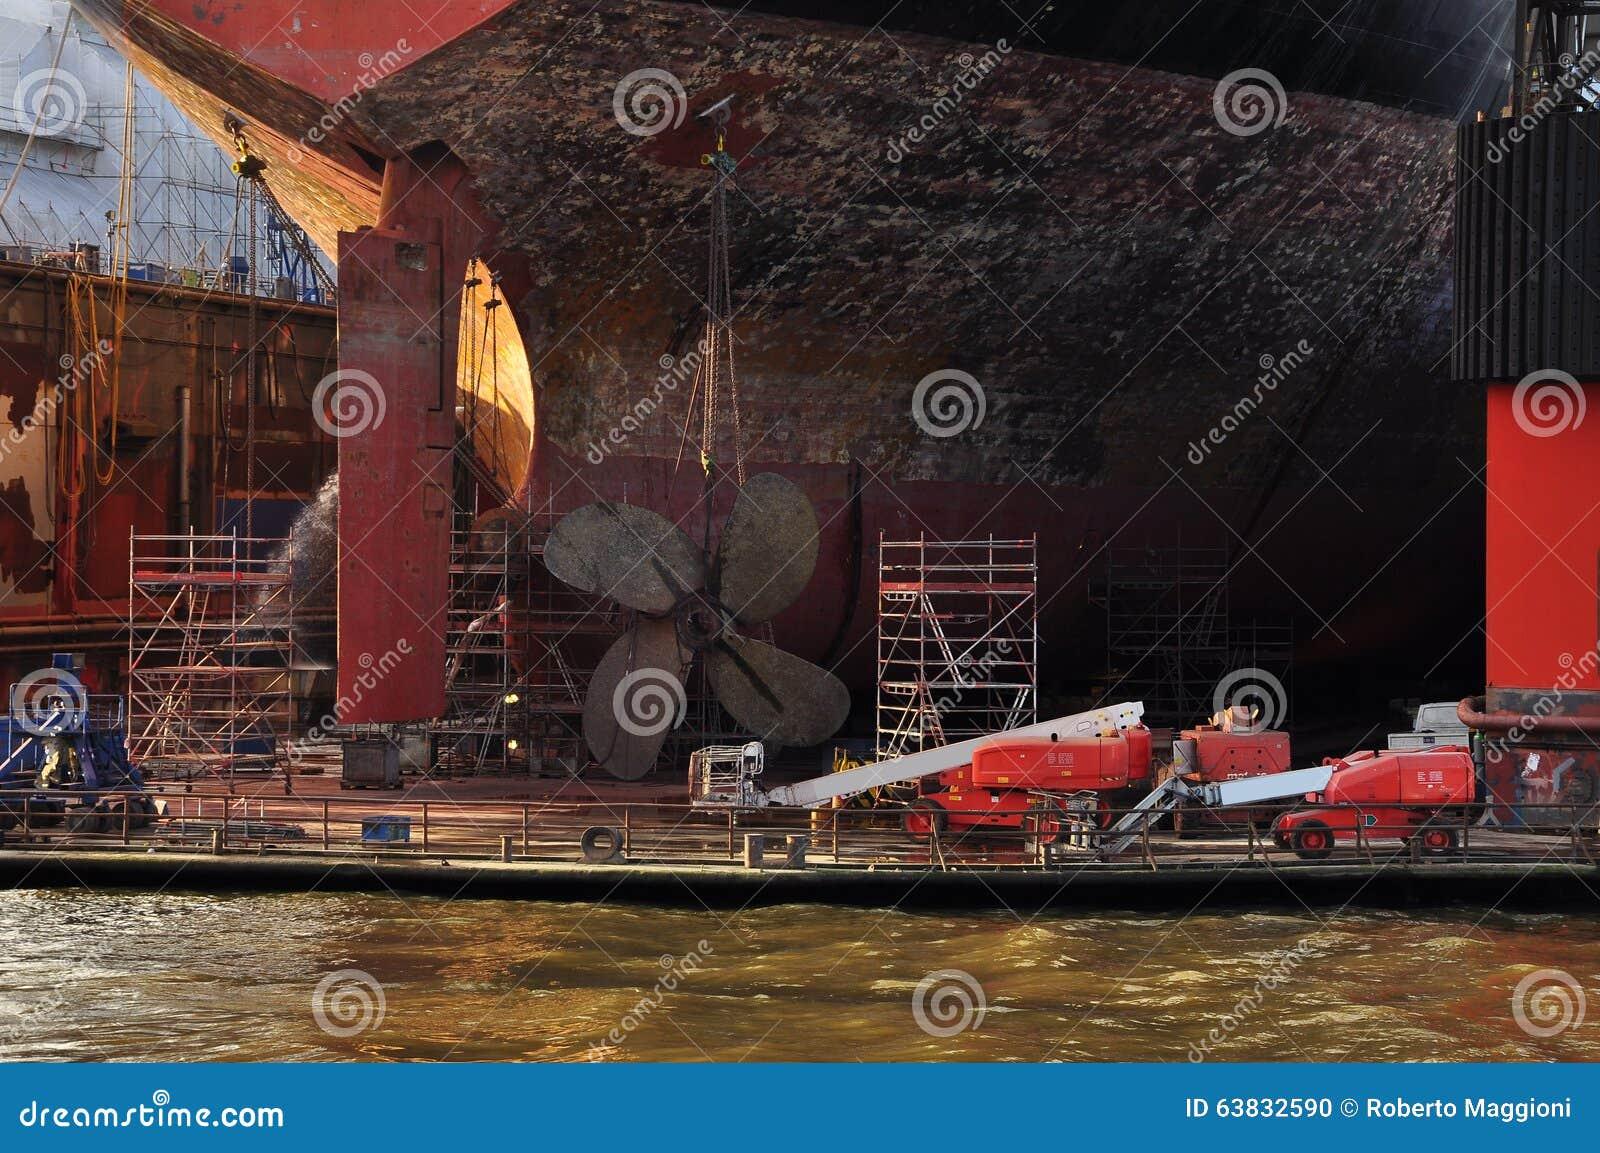 Ship building dock. Shipyard in Hamburg, Germany